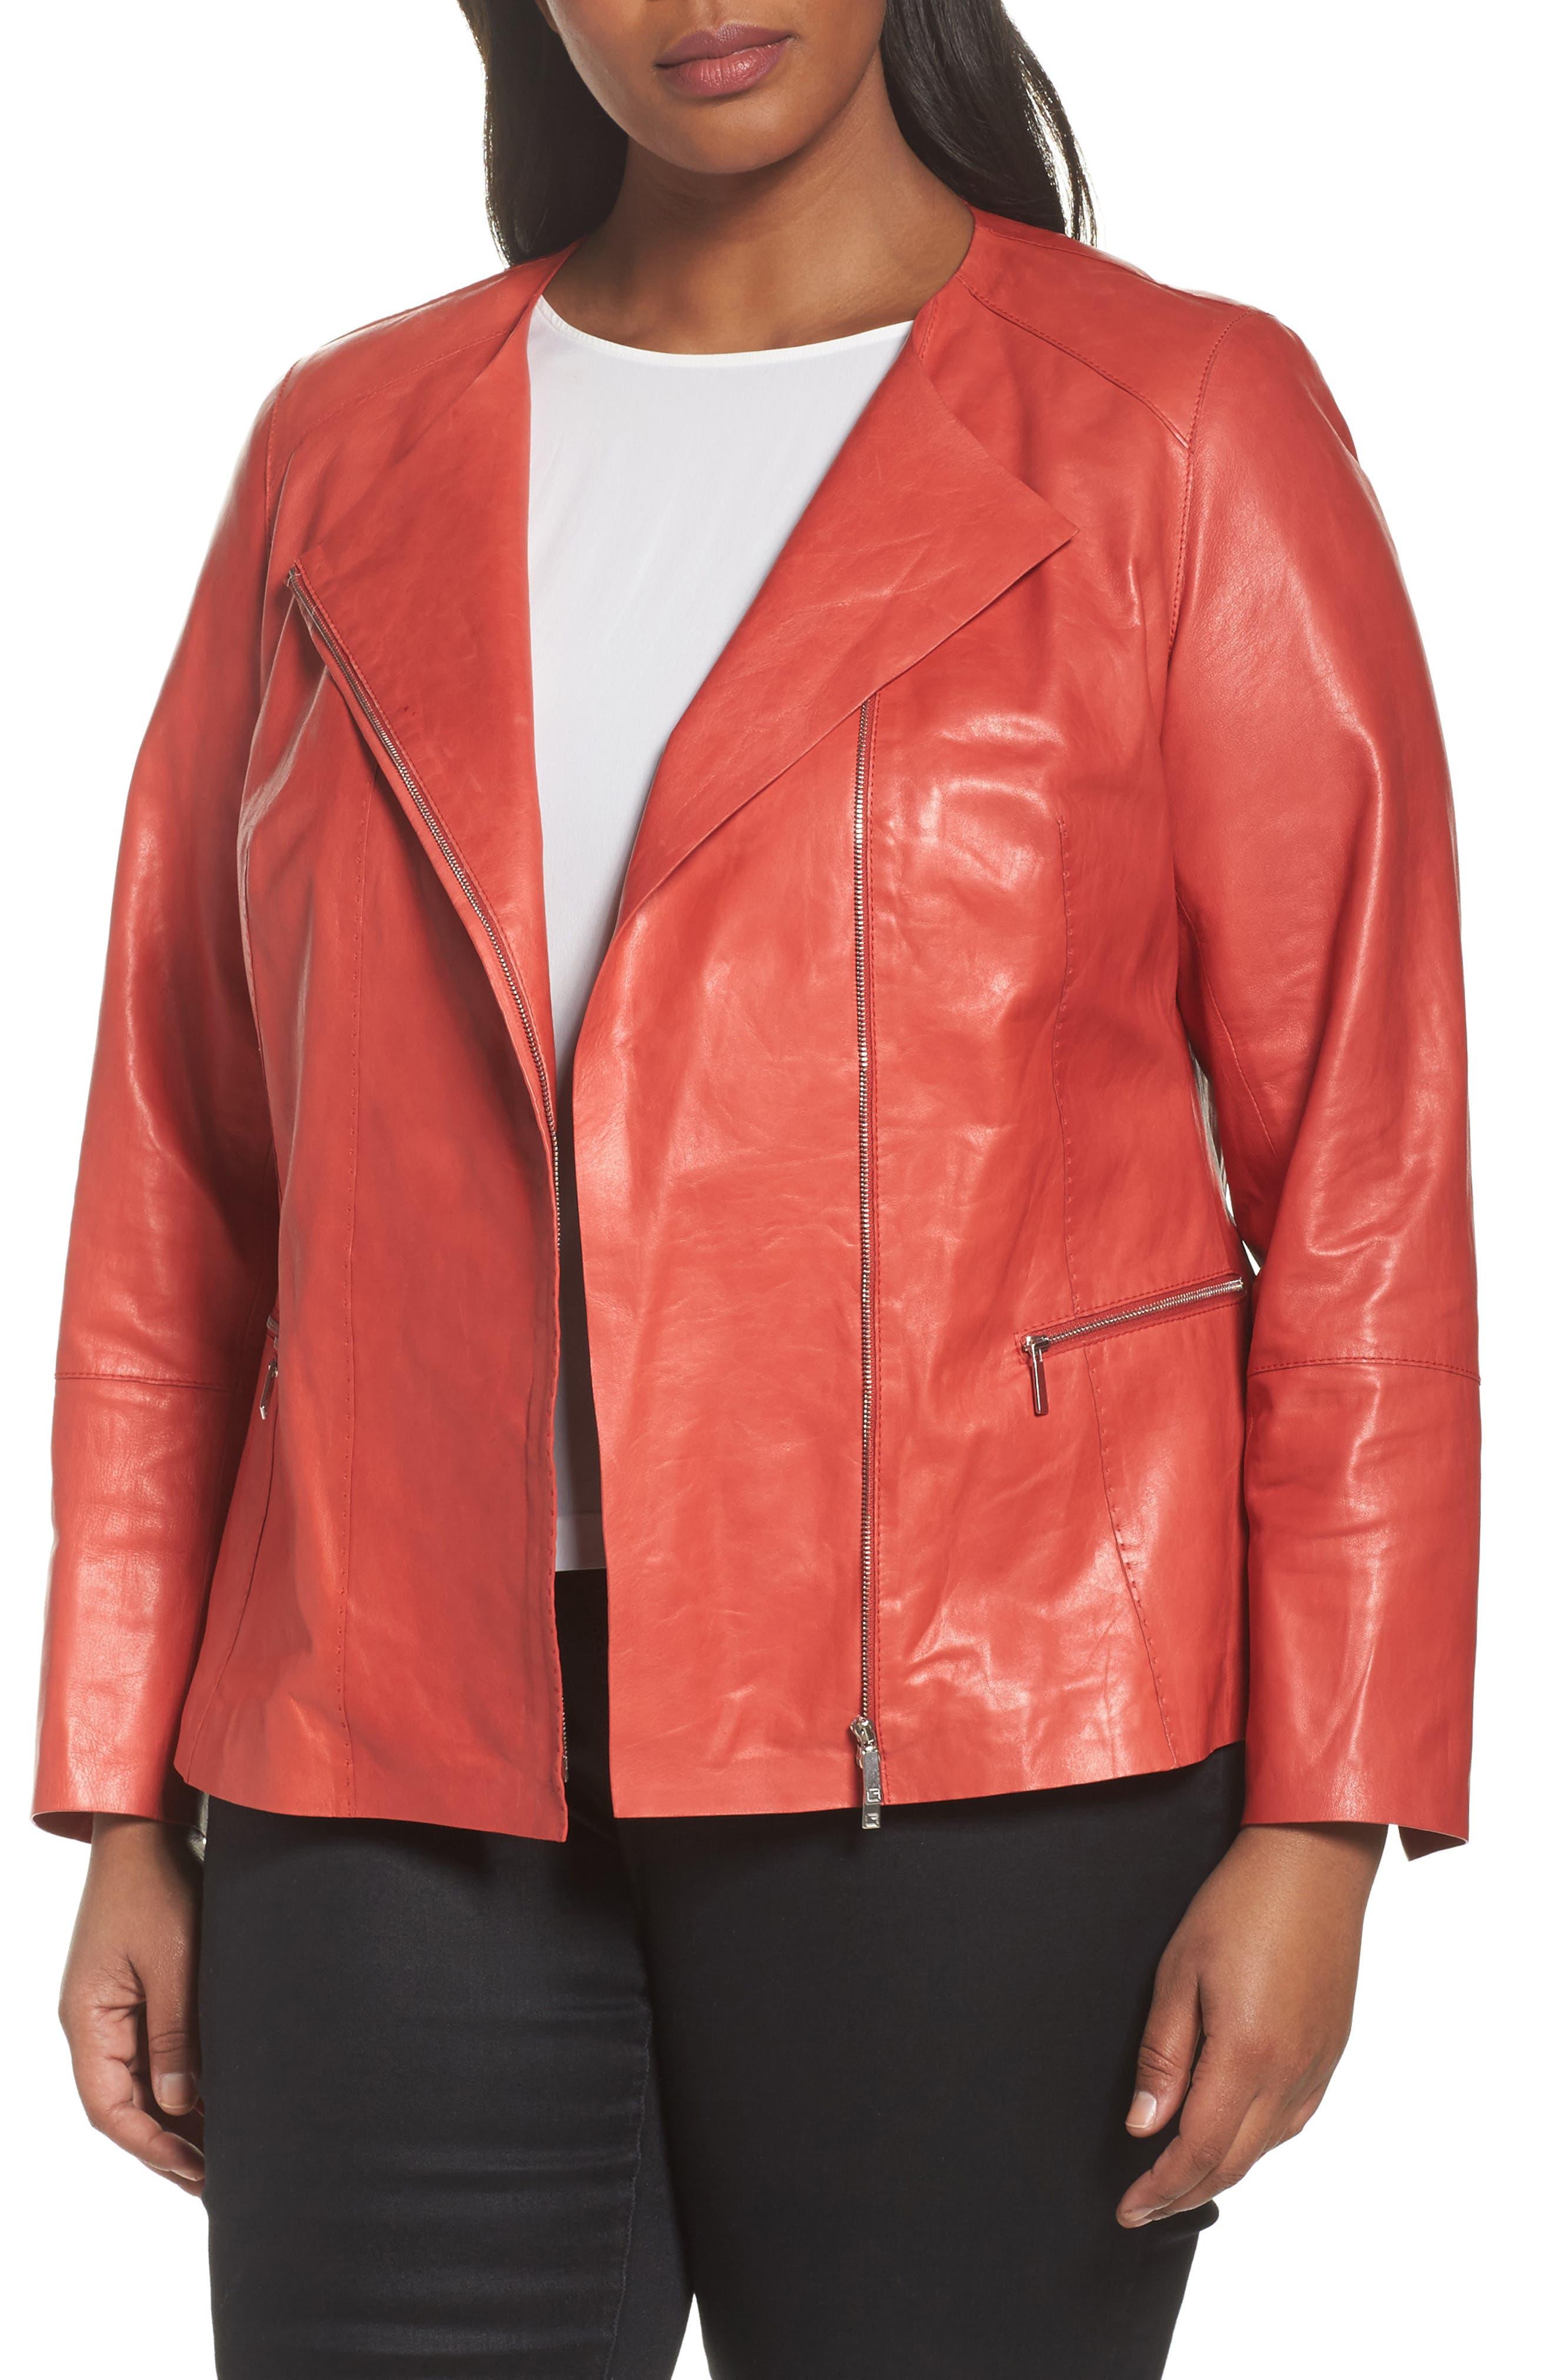 Caridee Glazed Lambskin Leather Jacket,                         Main,                         color, 604